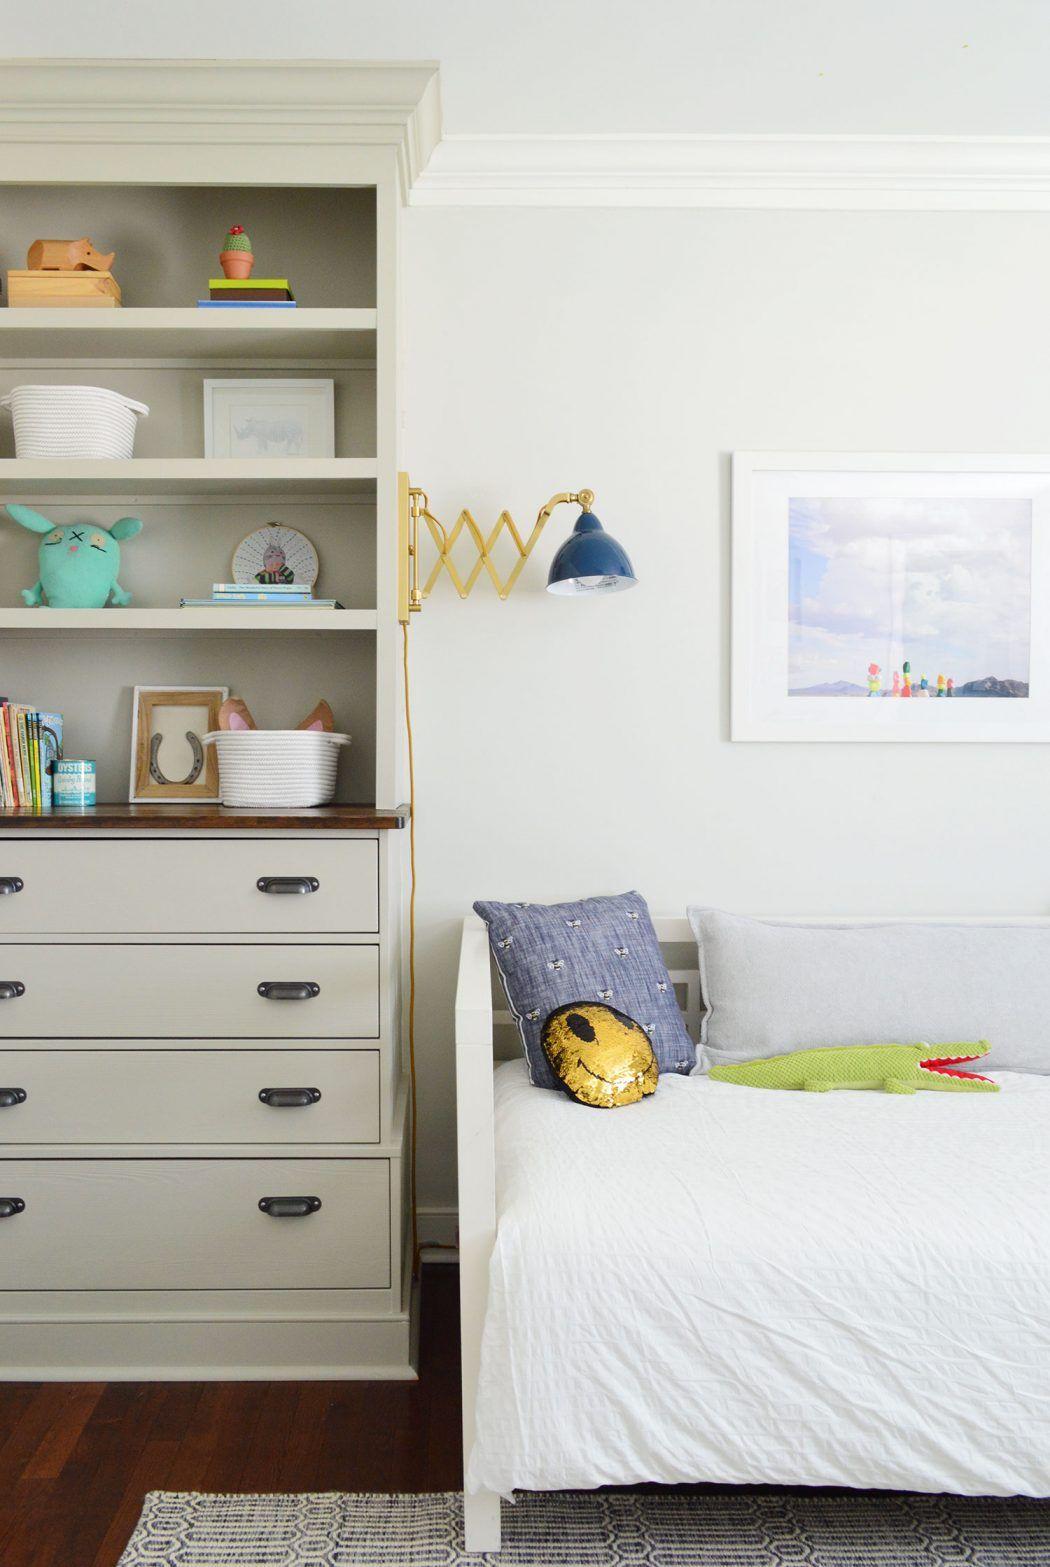 d51cc7f689c 30 Genius Toy Storage Ideas For Your Kid s Room - DIY Kids Bedroom  Organization